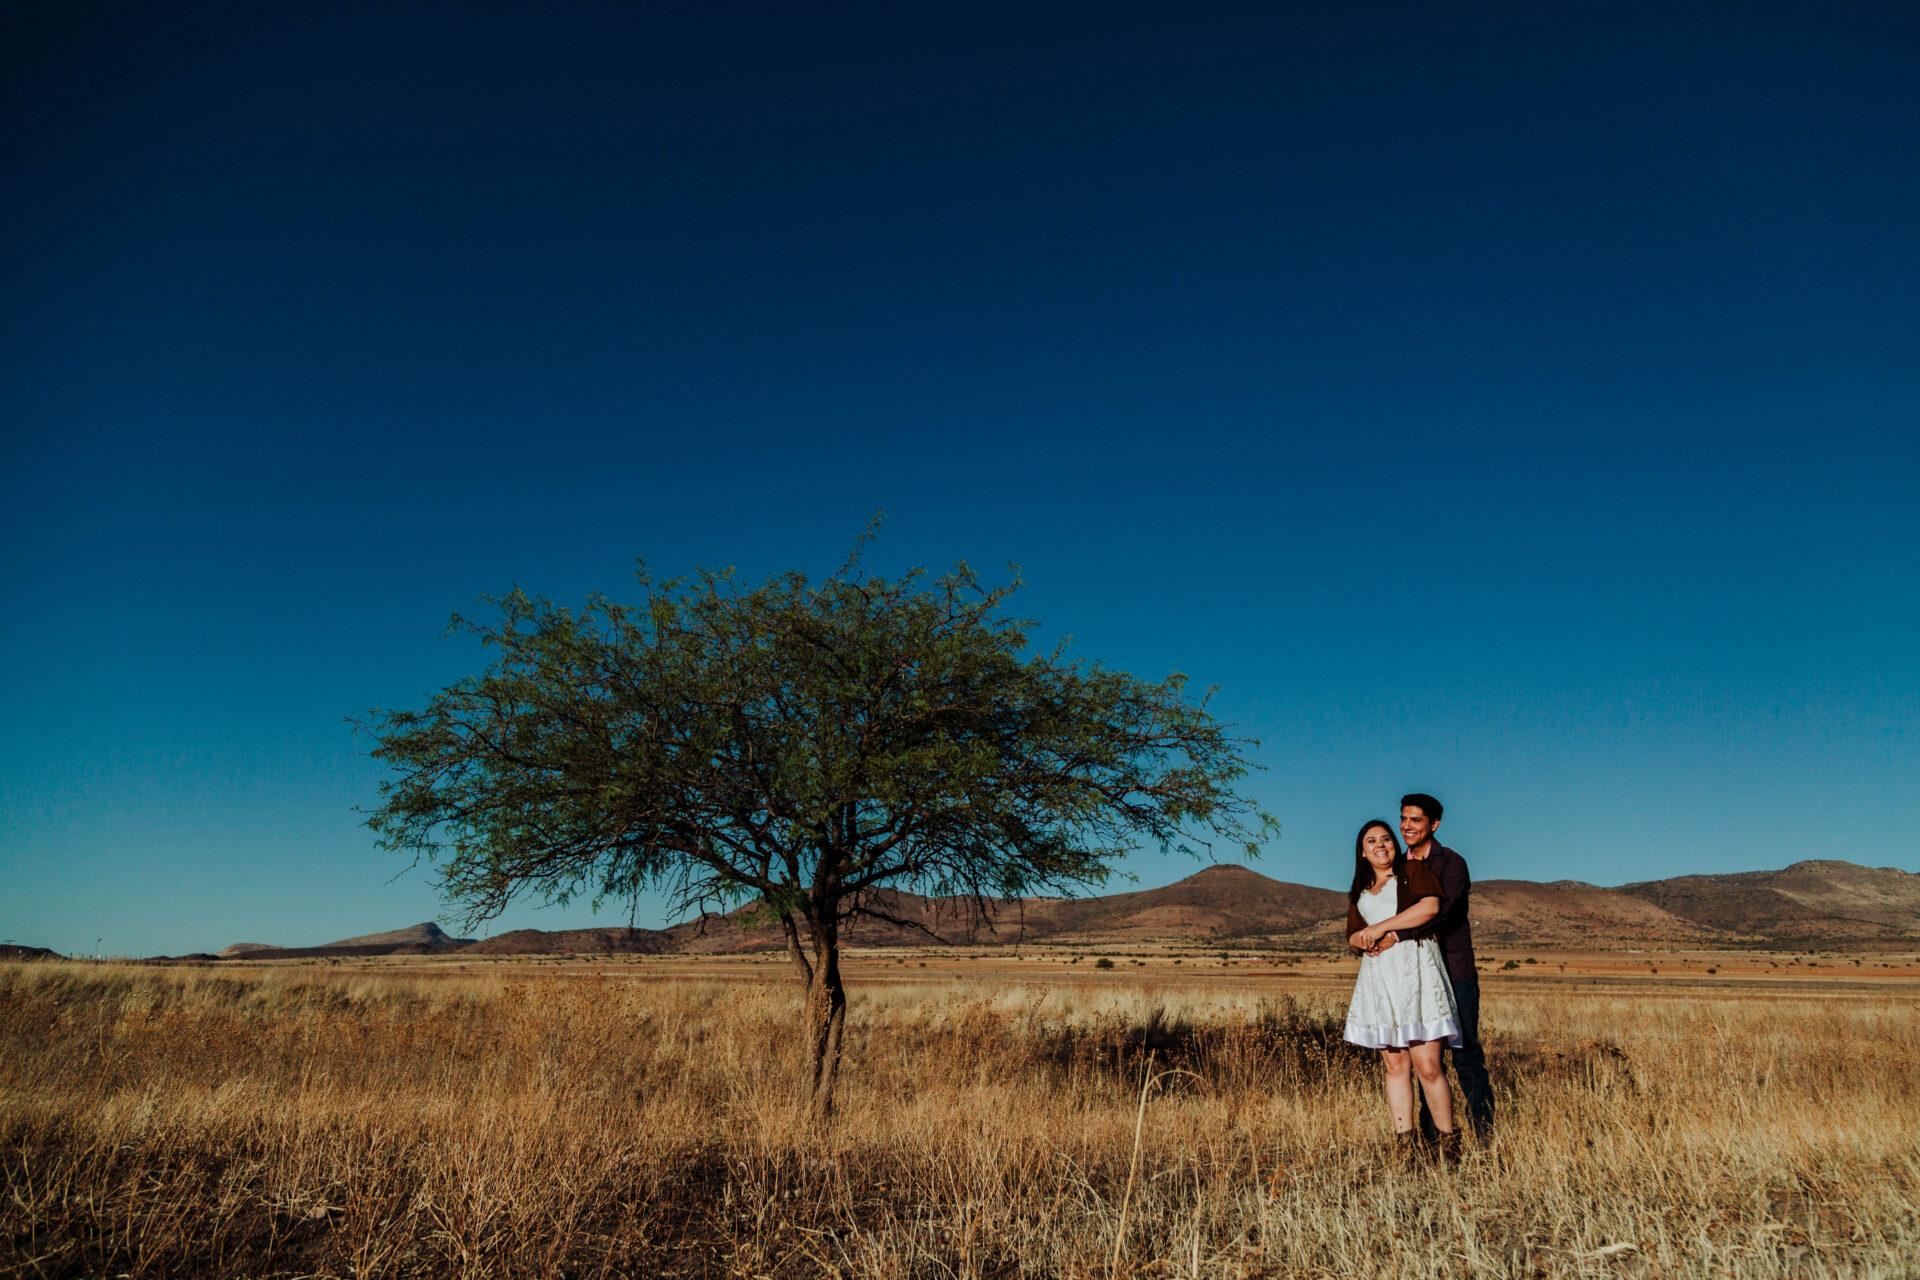 javier_noriega_fotografo_bodas_zacatecas_chihuahua_wedding_photographer1